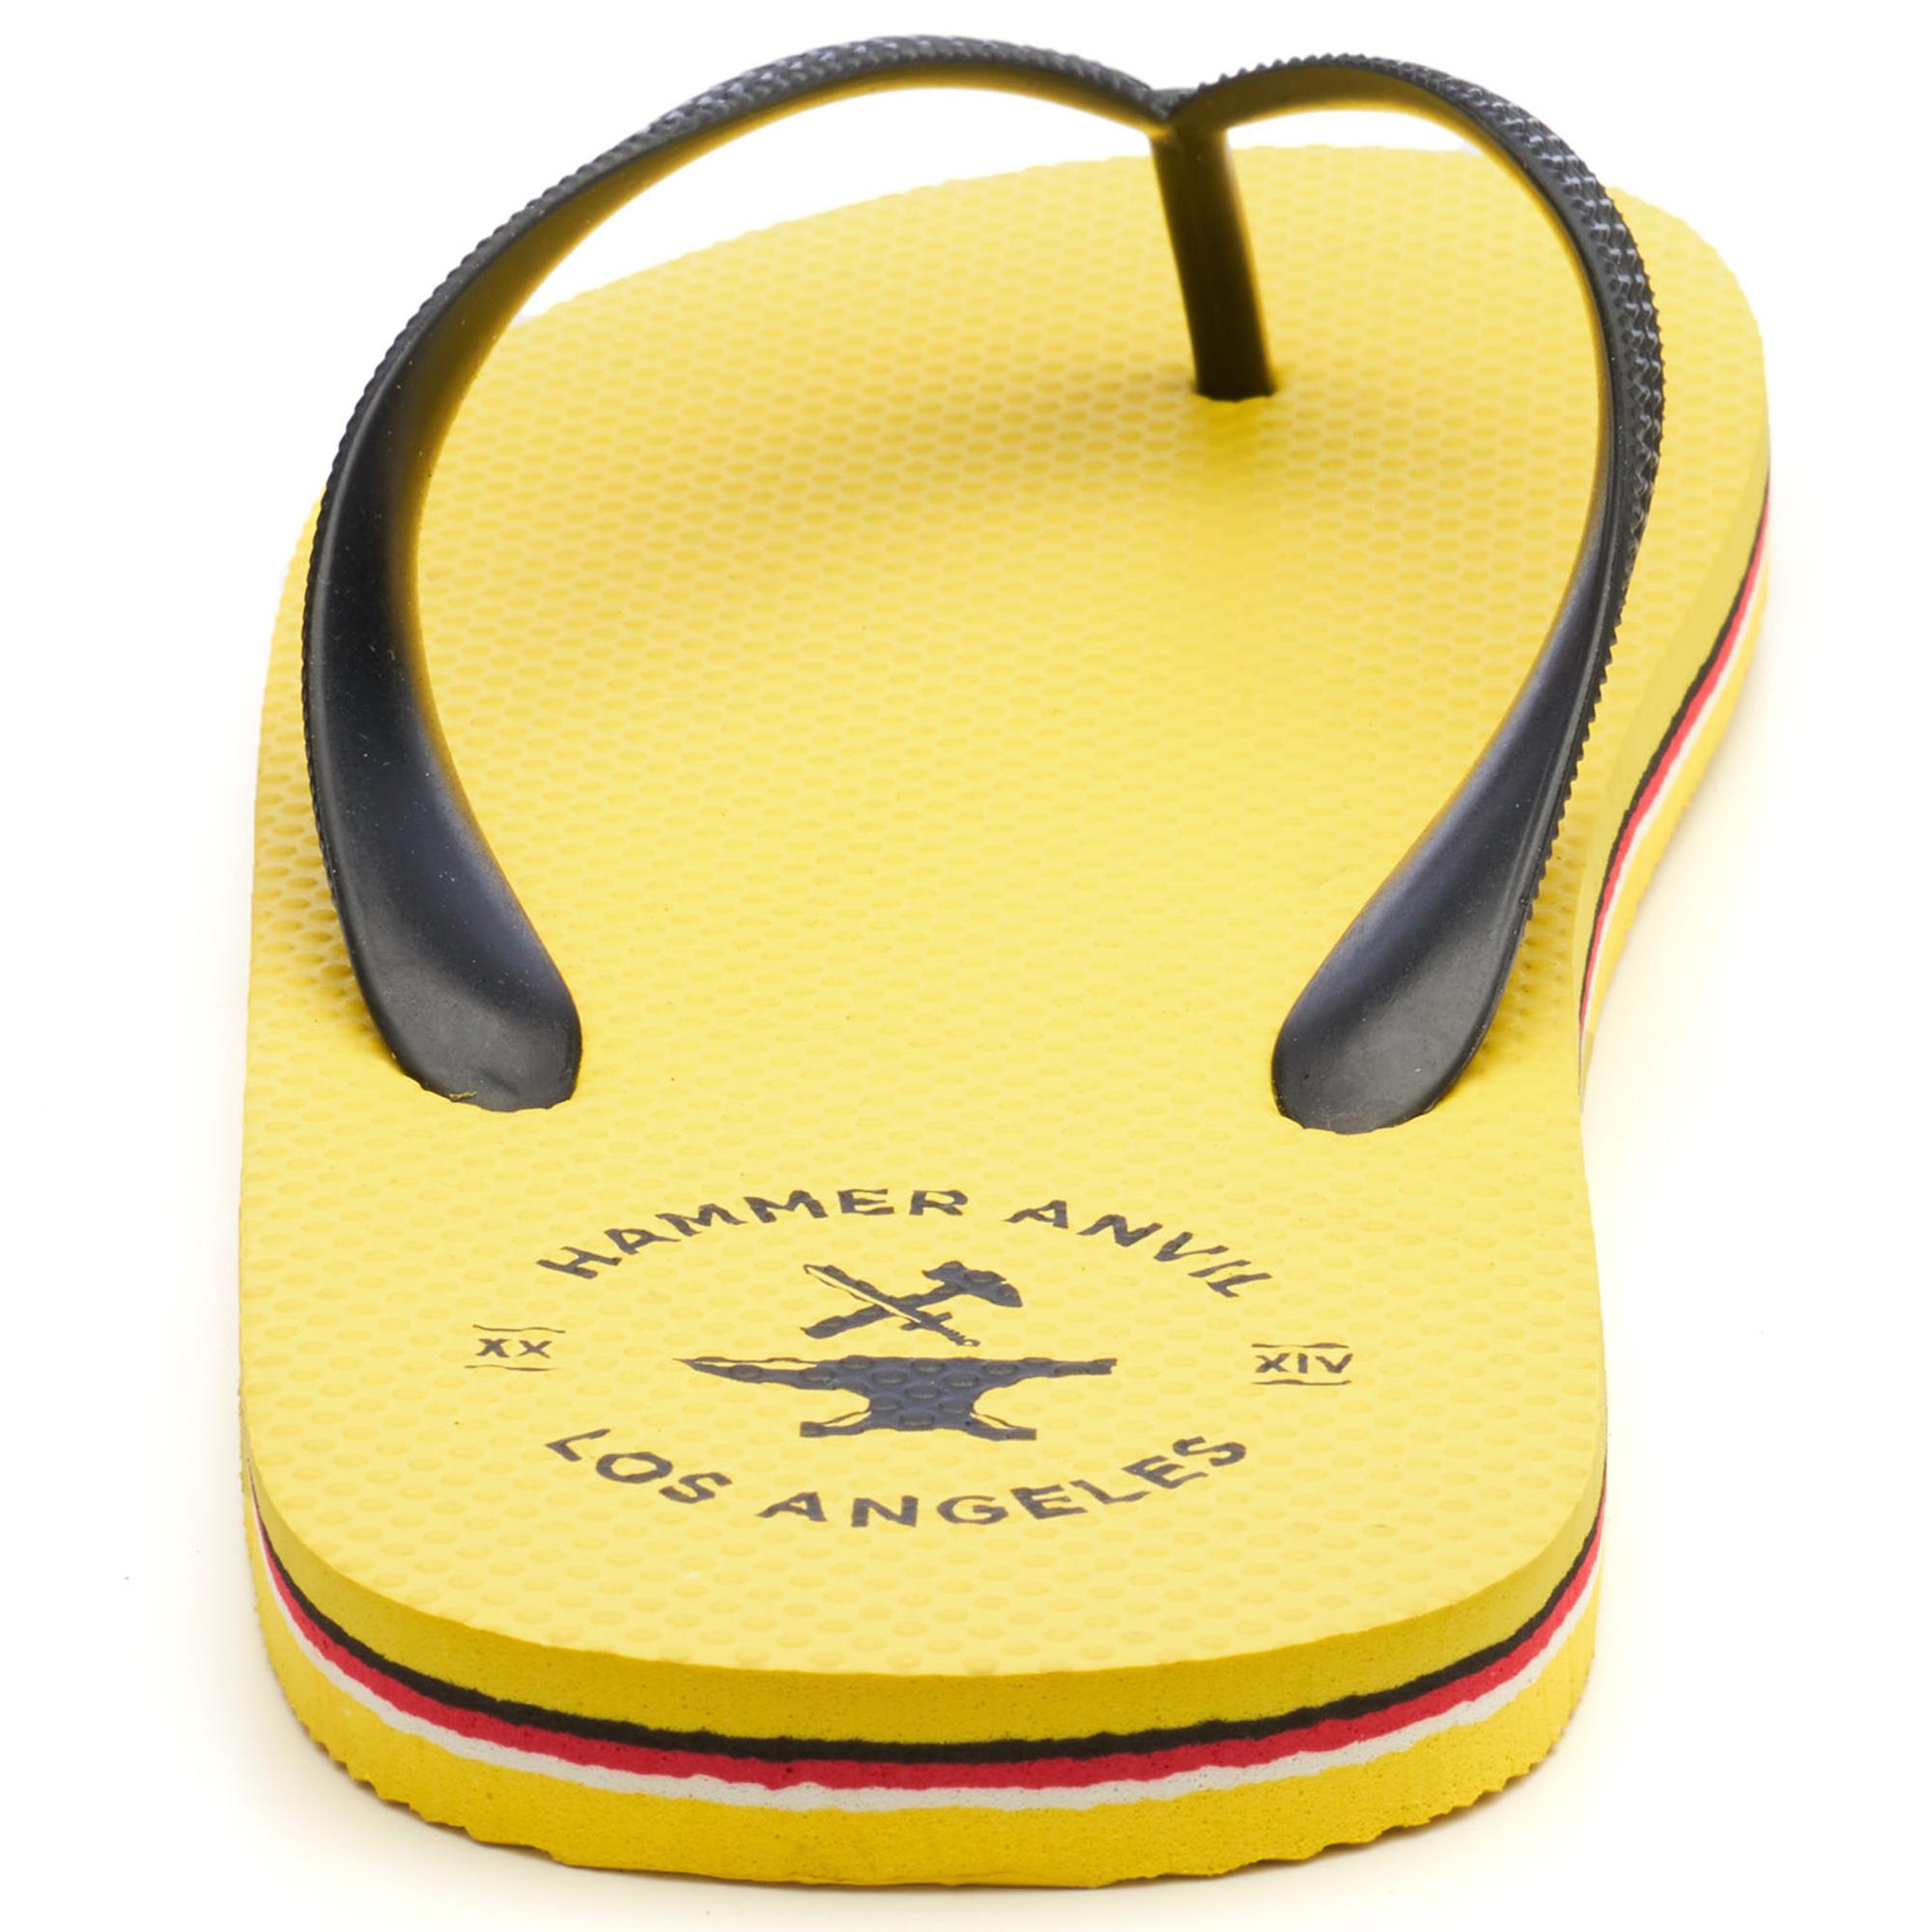 Hammer-Anvil-Mens-Flip-Flops-Casual-Thong-Summer-Sandals-Comfortable-Beach-Shoes thumbnail 50